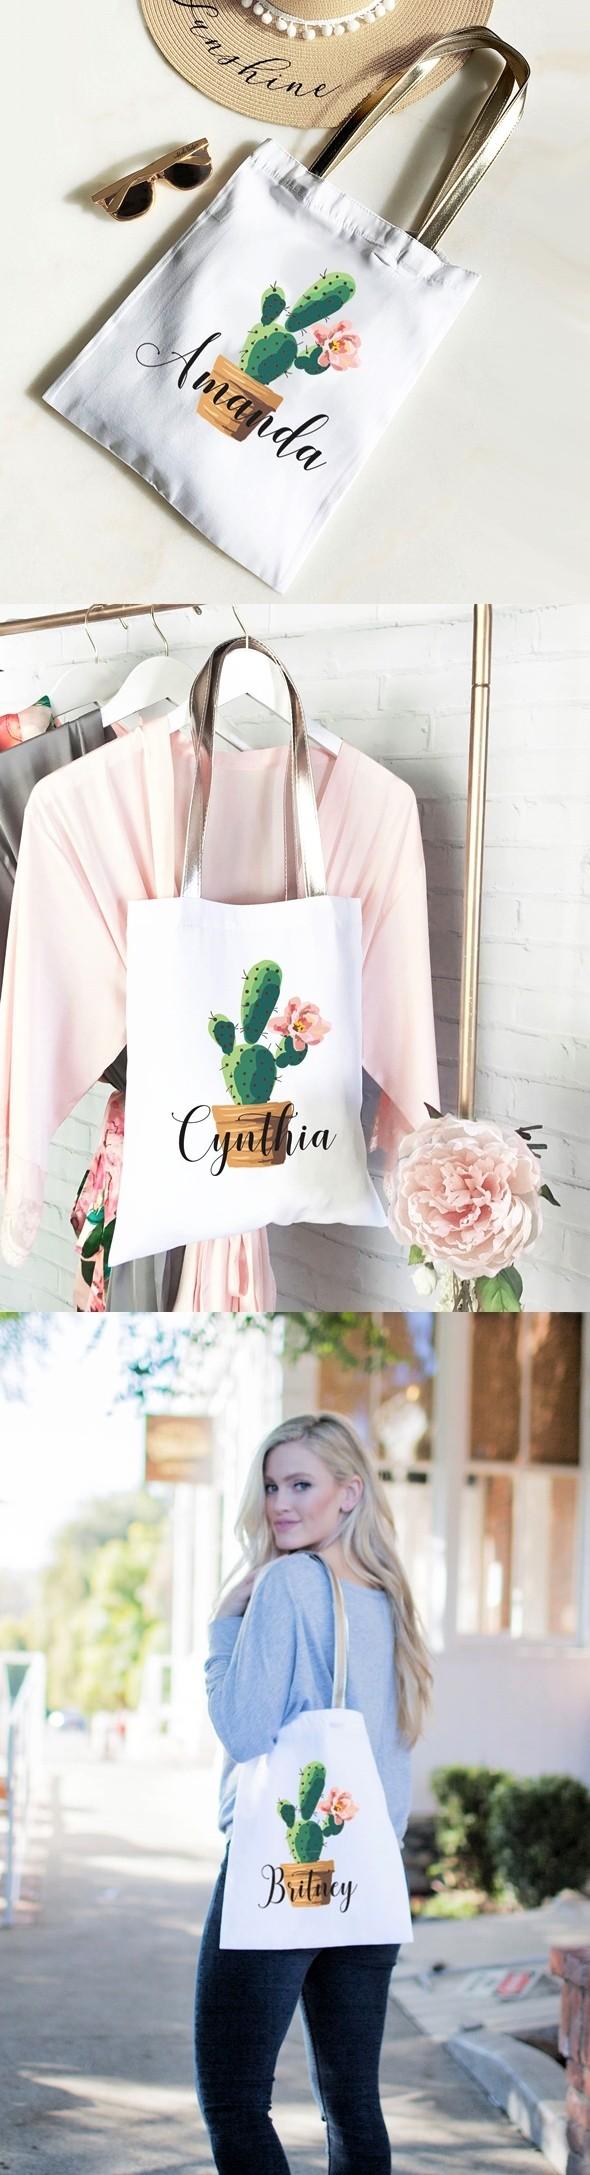 Event Blossom Personalized Fiesta Cactus Design Tote Bag